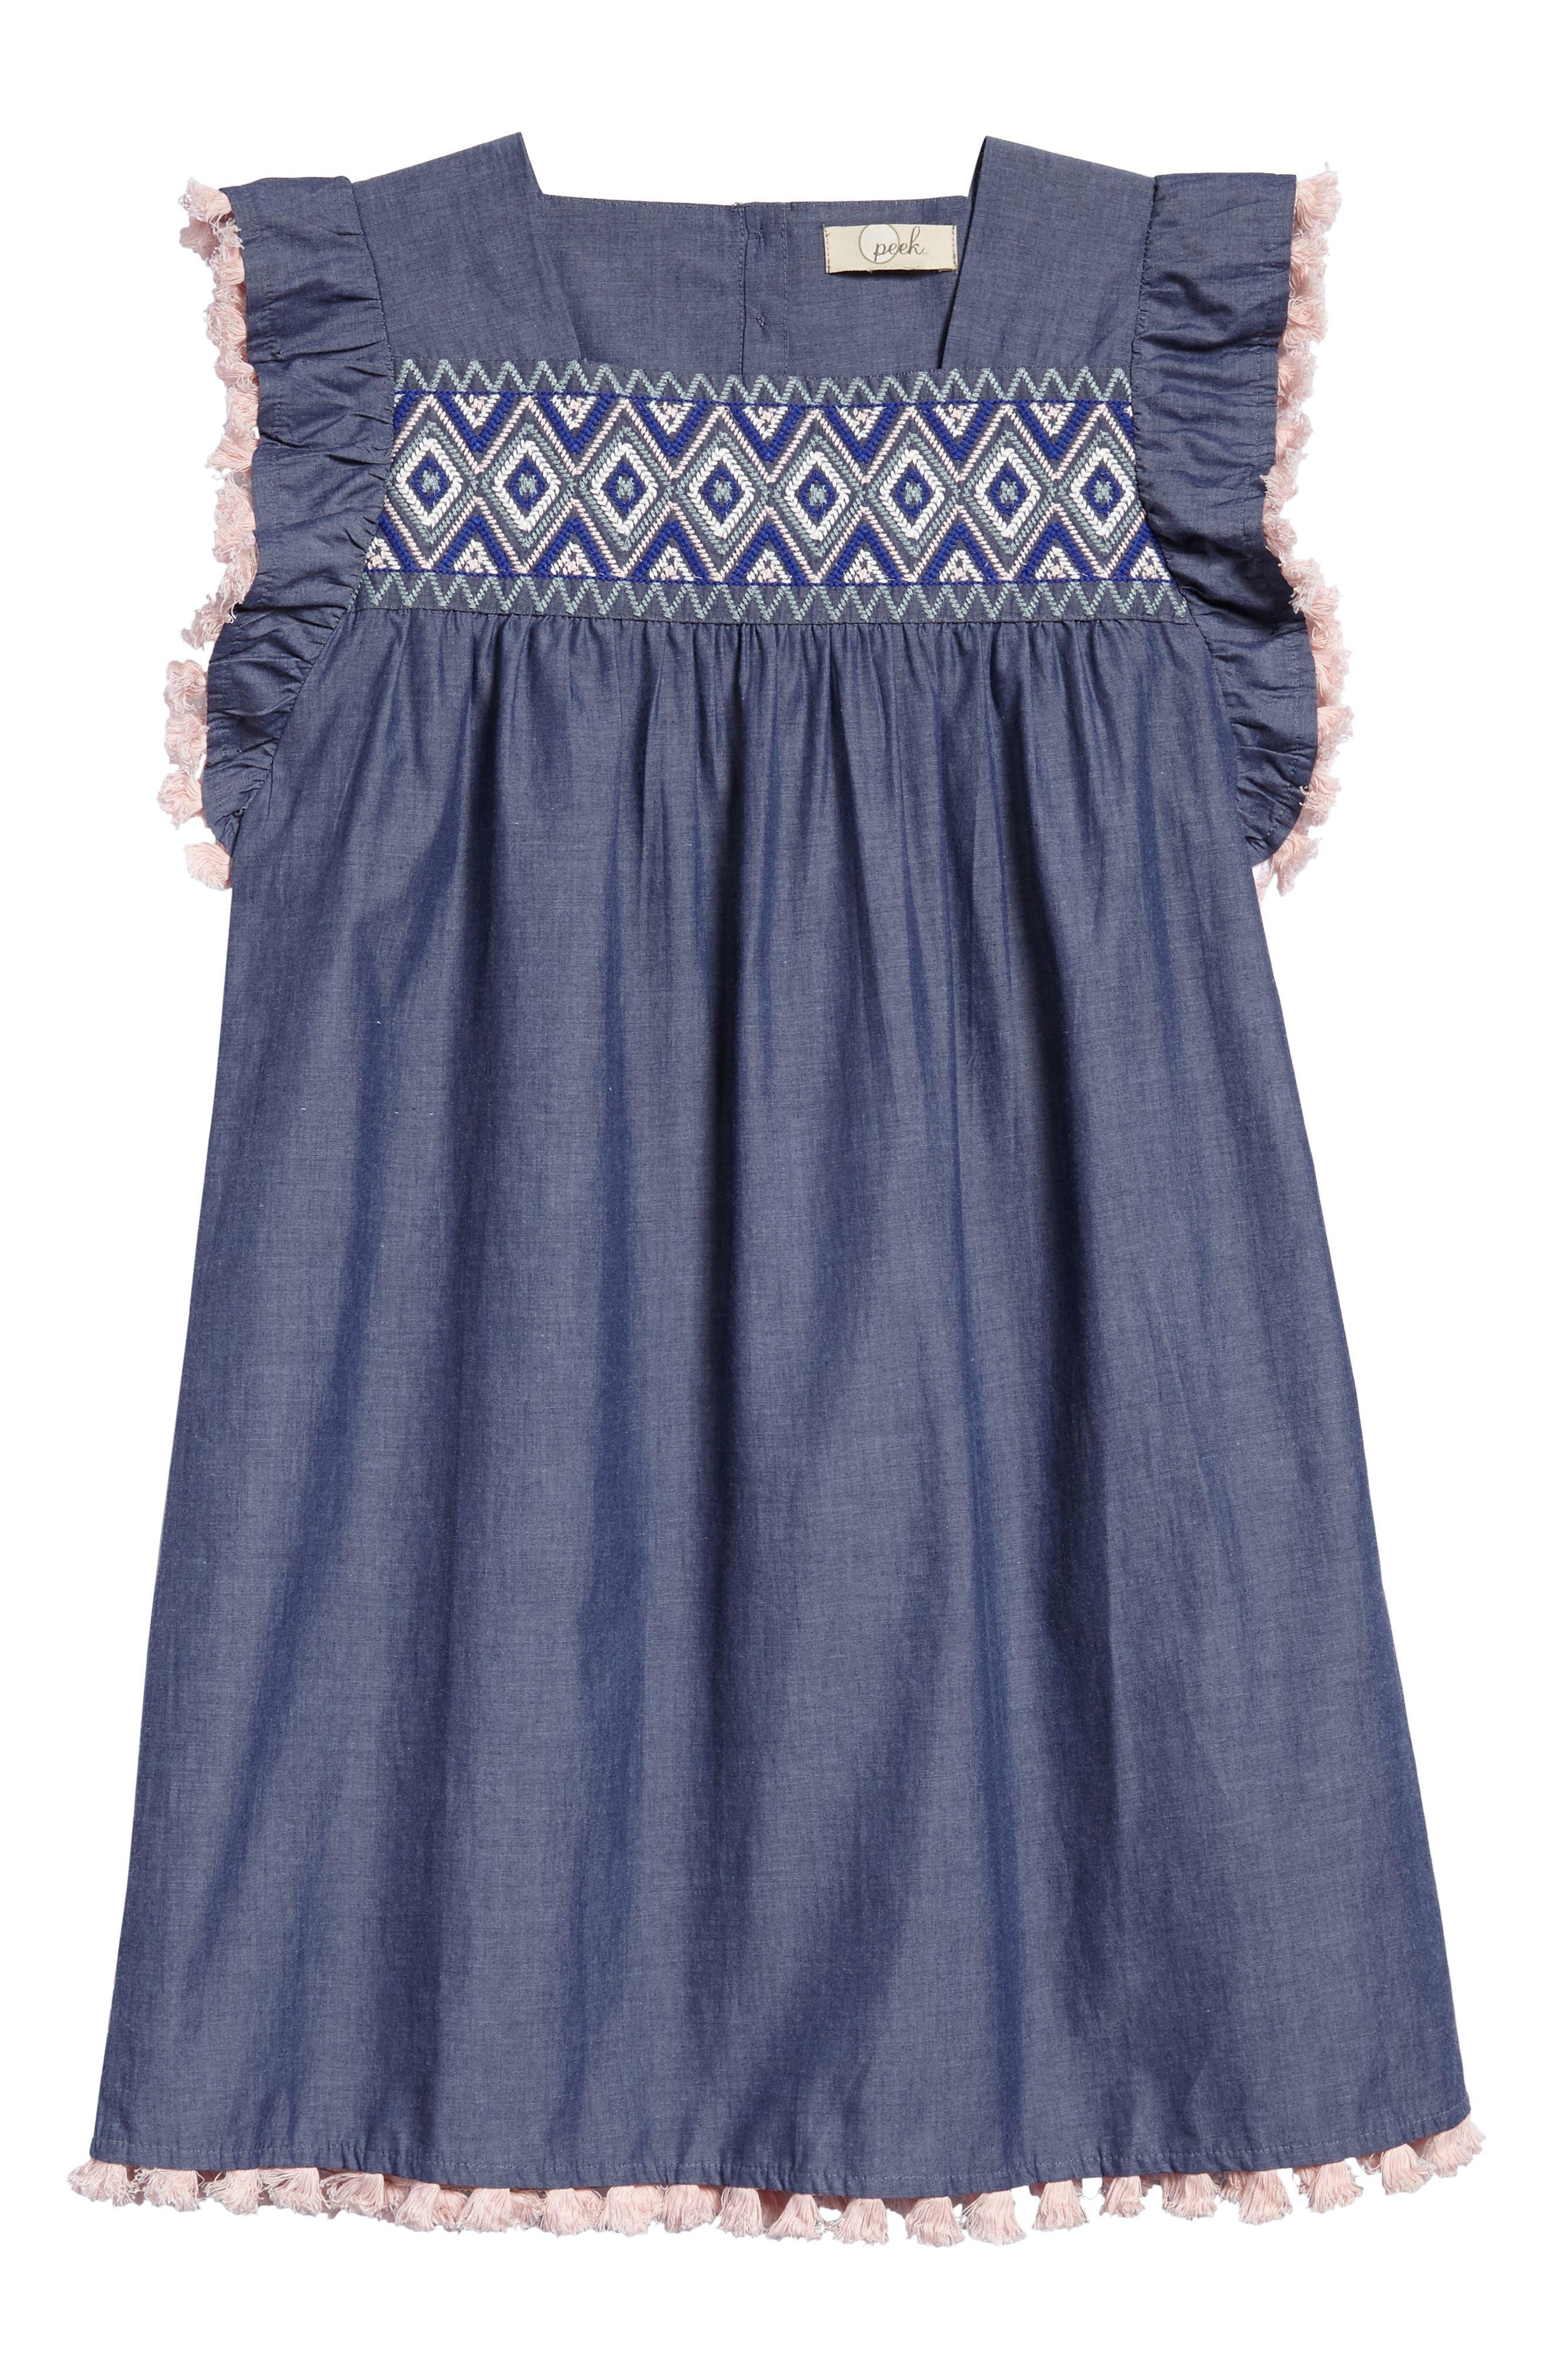 Sophia Embroidered Dress,                             Main thumbnail 1, color,                             Chambray